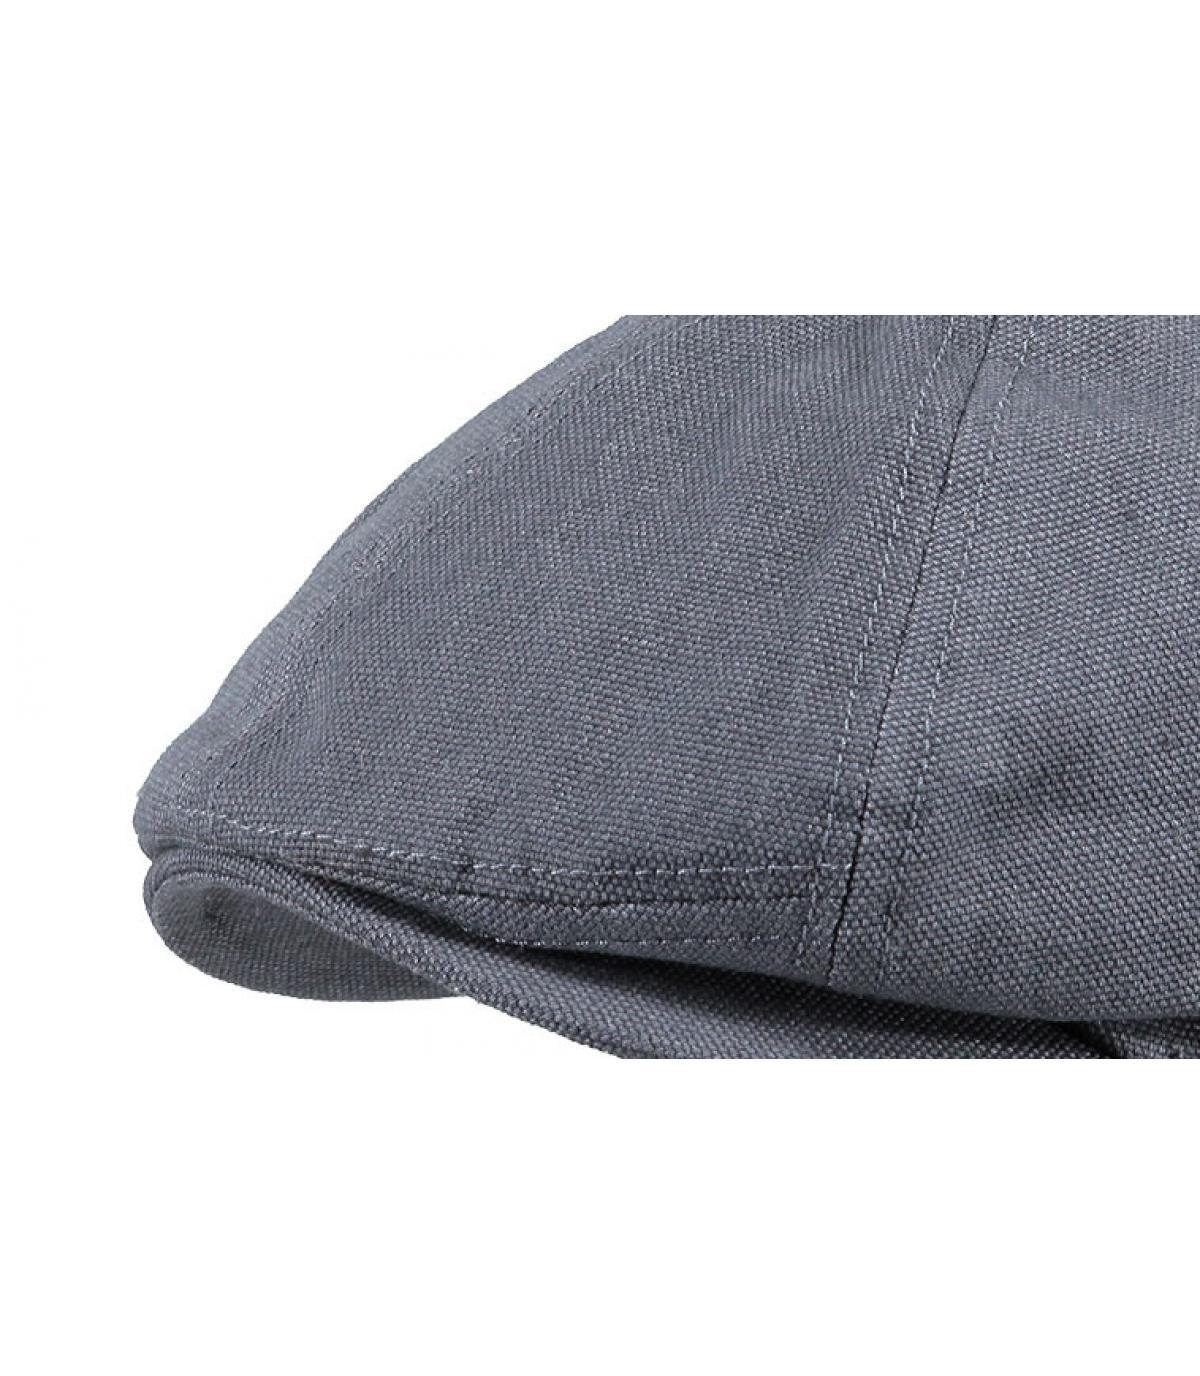 casquette gavroche enfant grise jamaica cap kids dark grey par barts. Black Bedroom Furniture Sets. Home Design Ideas